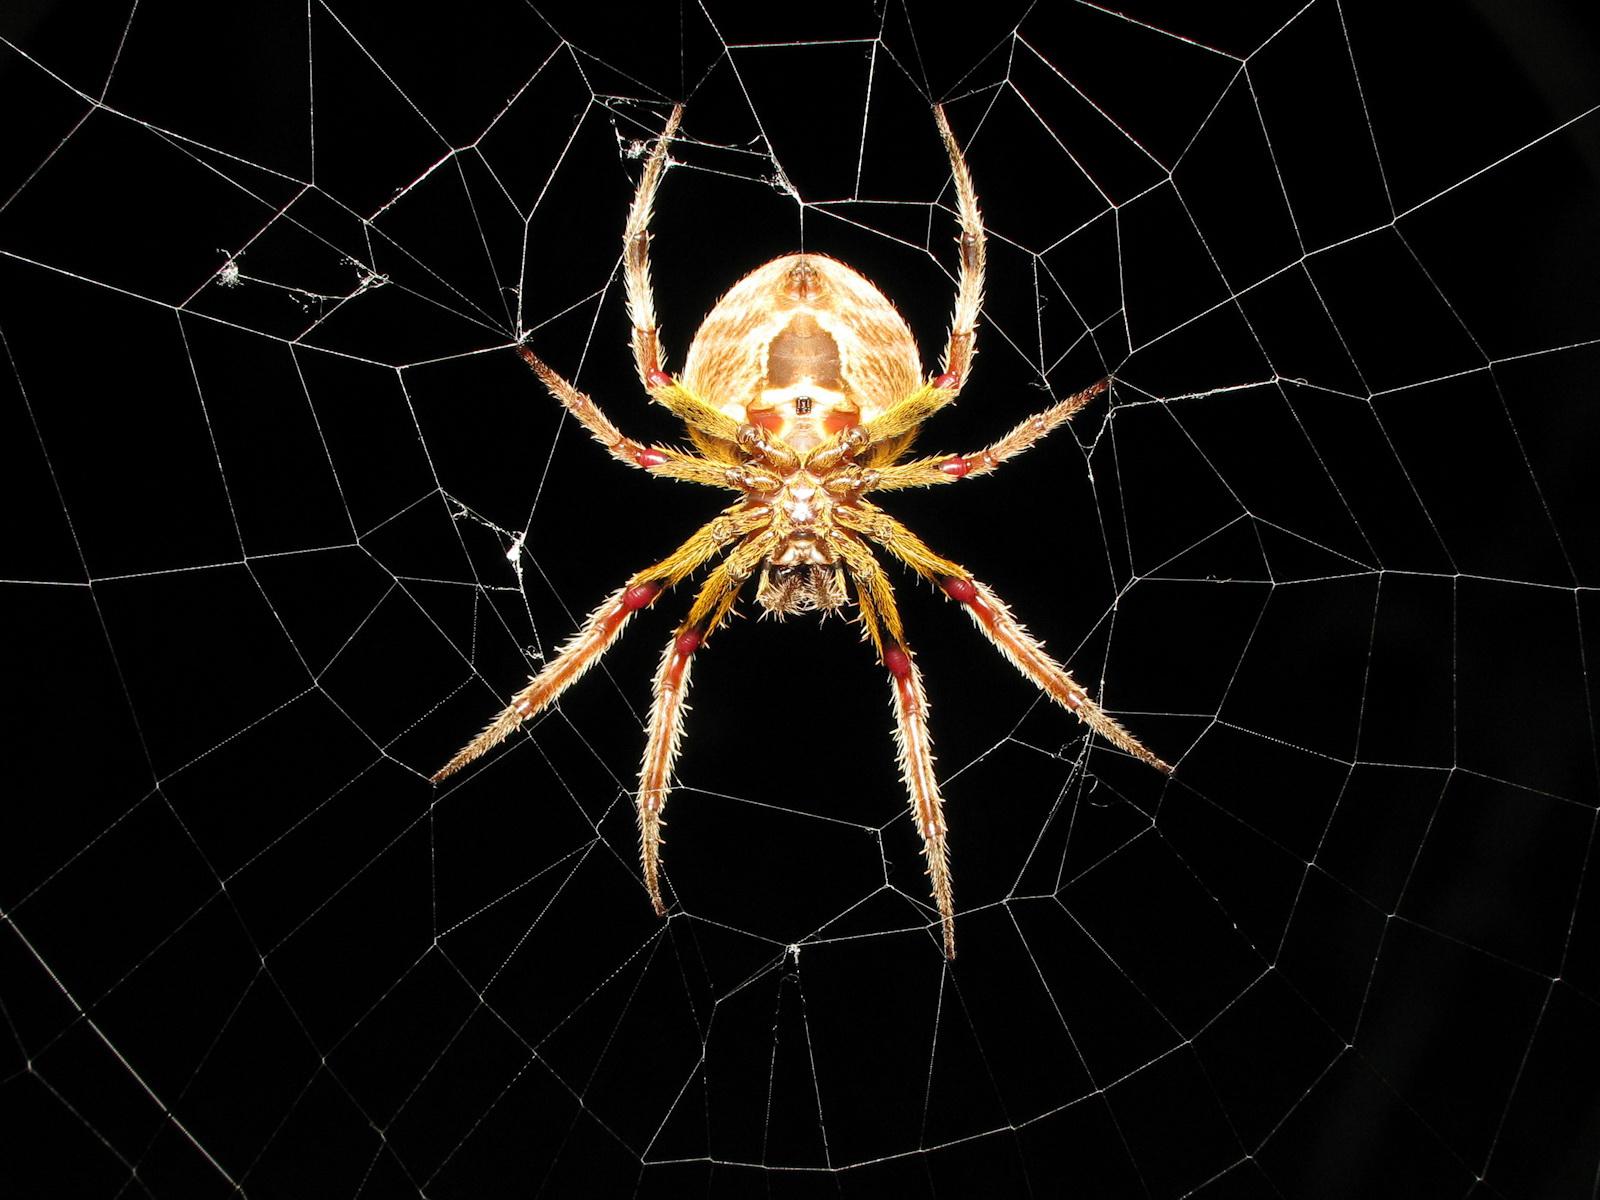 Cool Spider HD Wallpaper Desktop Download